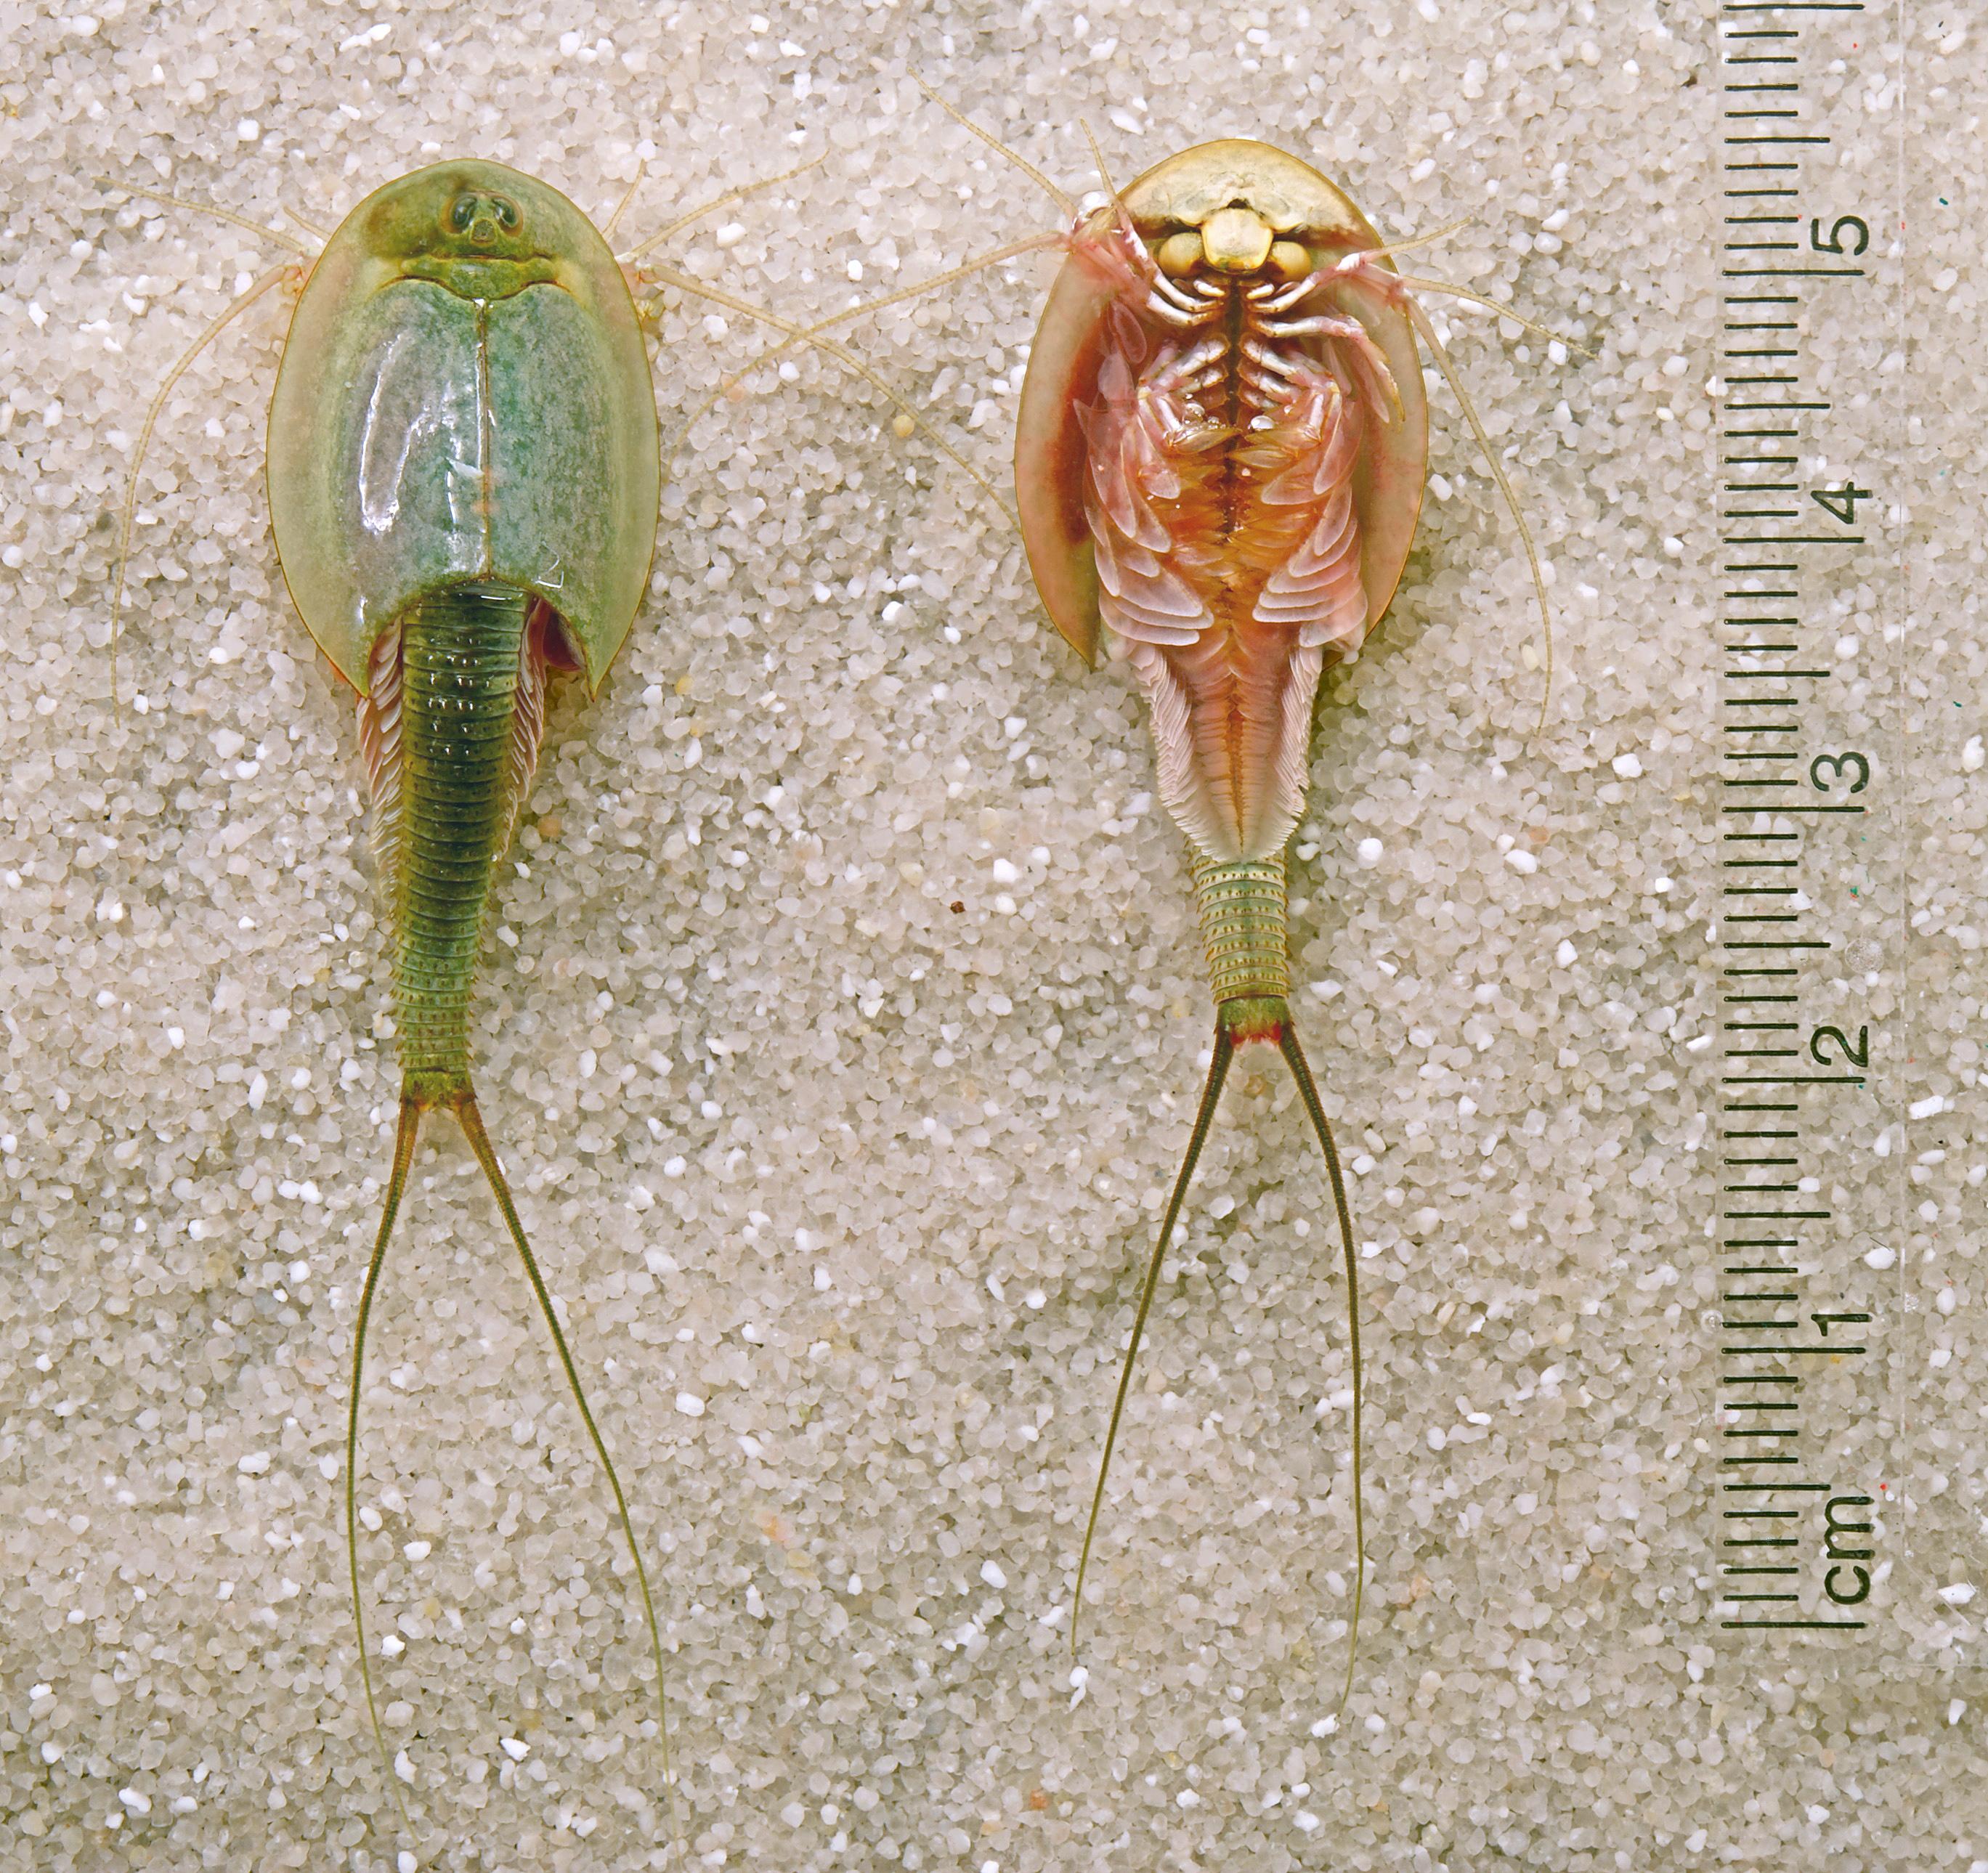 ... commonly called longtail tadpole shrimp american tadpole shrimp